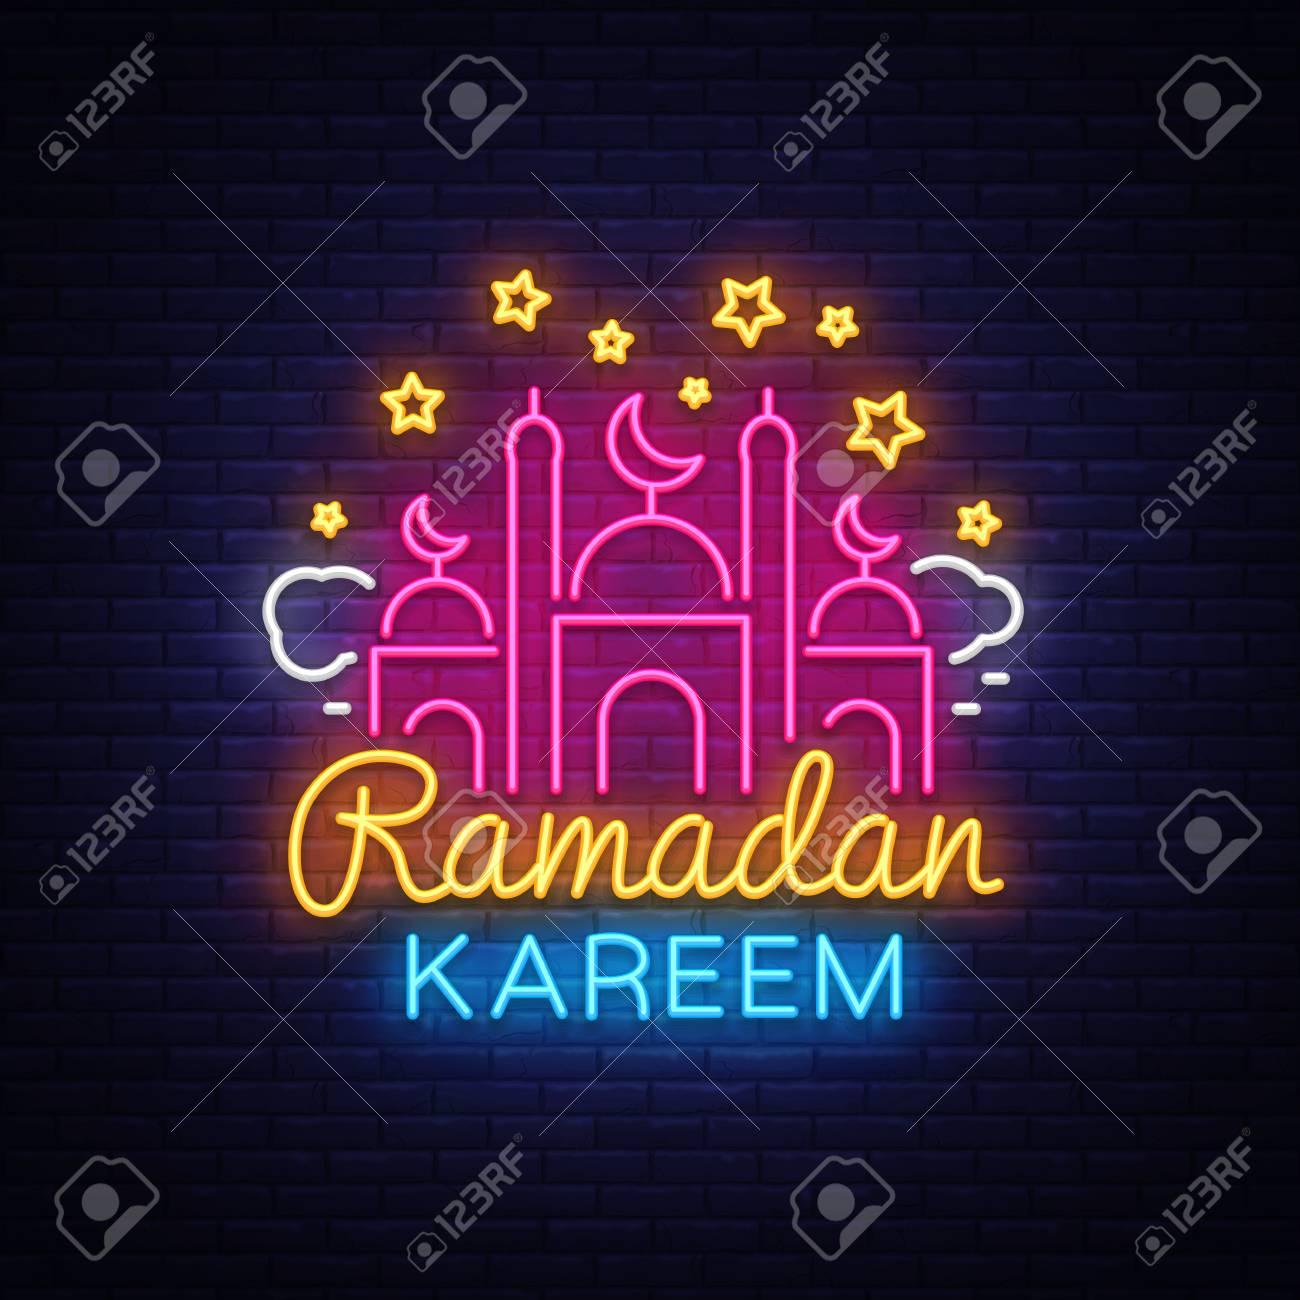 Ramadan kareem greeting cards neon sign design template light ramadan kareem greeting cards neon sign design template light banner night neon m4hsunfo